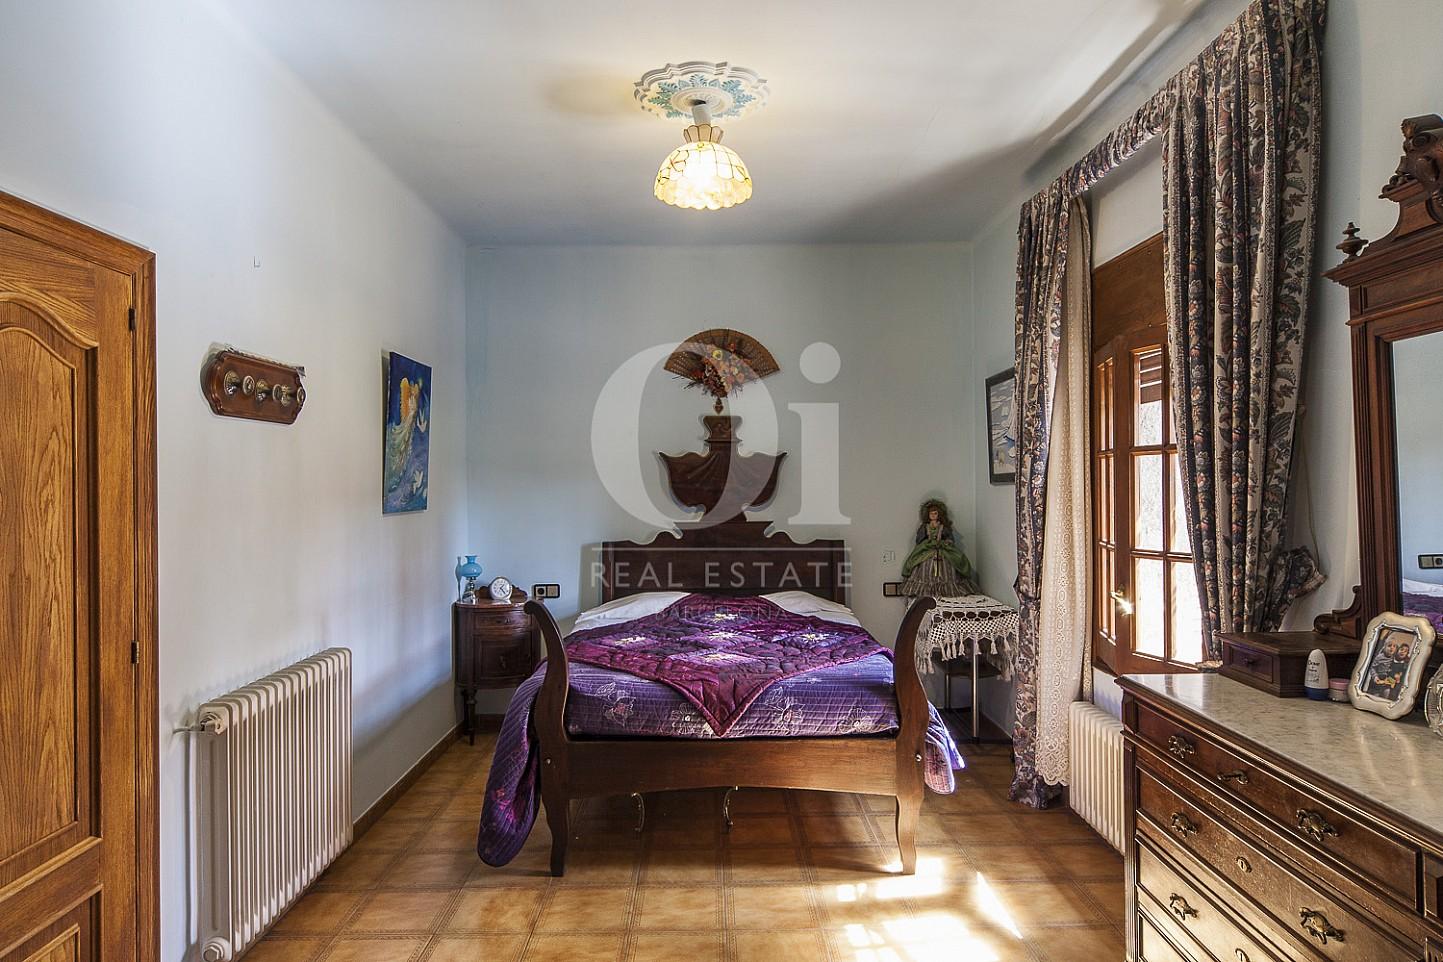 Cuarto de matrimonio de casa en venta en Borrassà, alto Ampurdán, Gerona